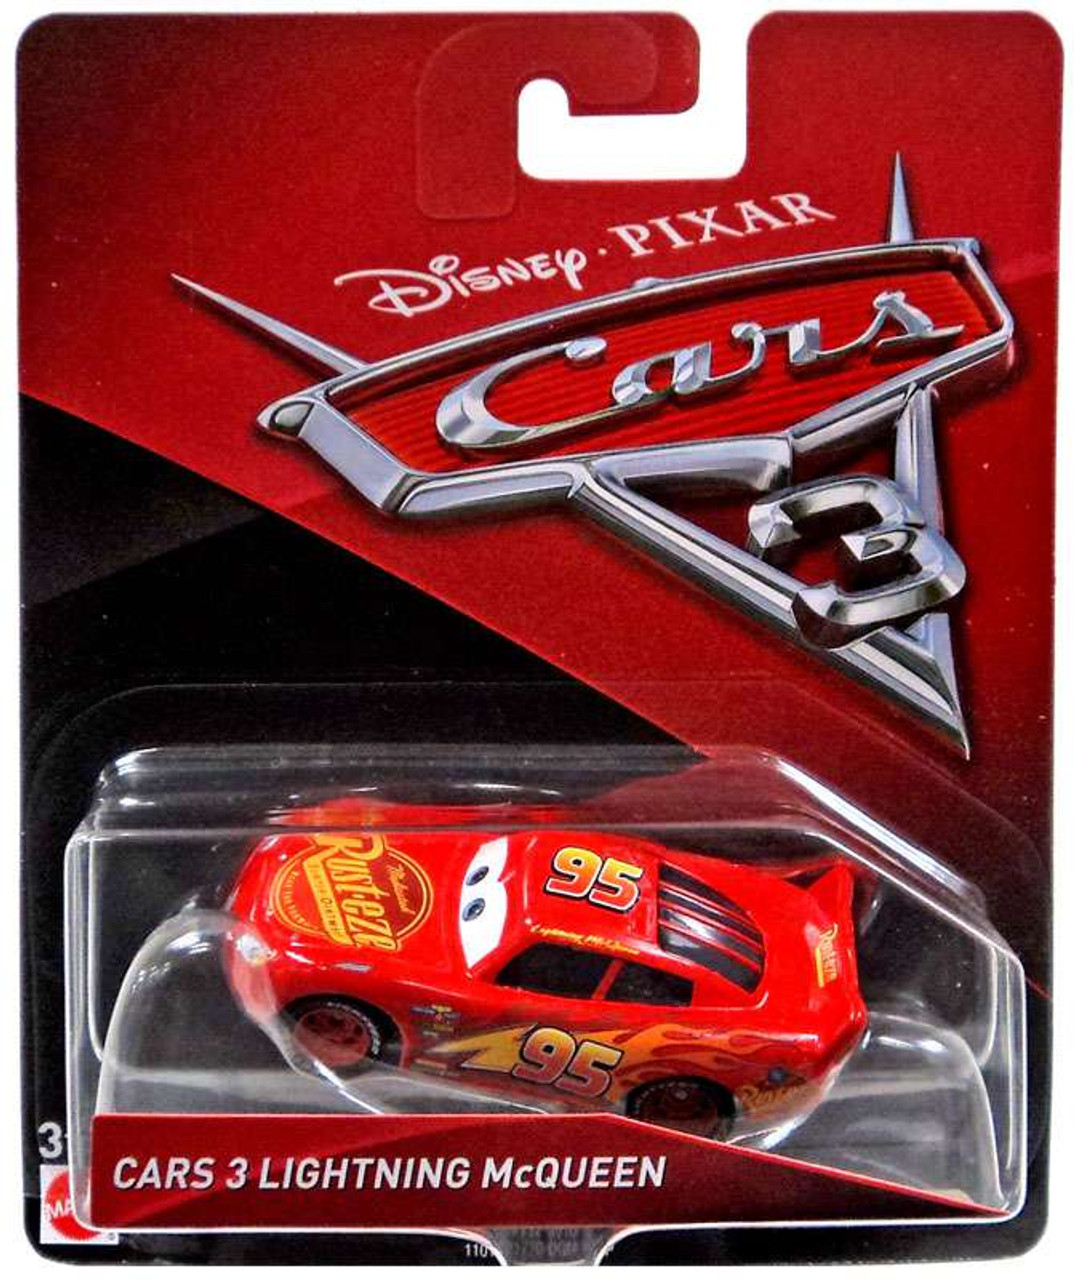 Disney Pixar Cars Cars 3 Lightning Mcqueen 155 Diecast Car Mattel